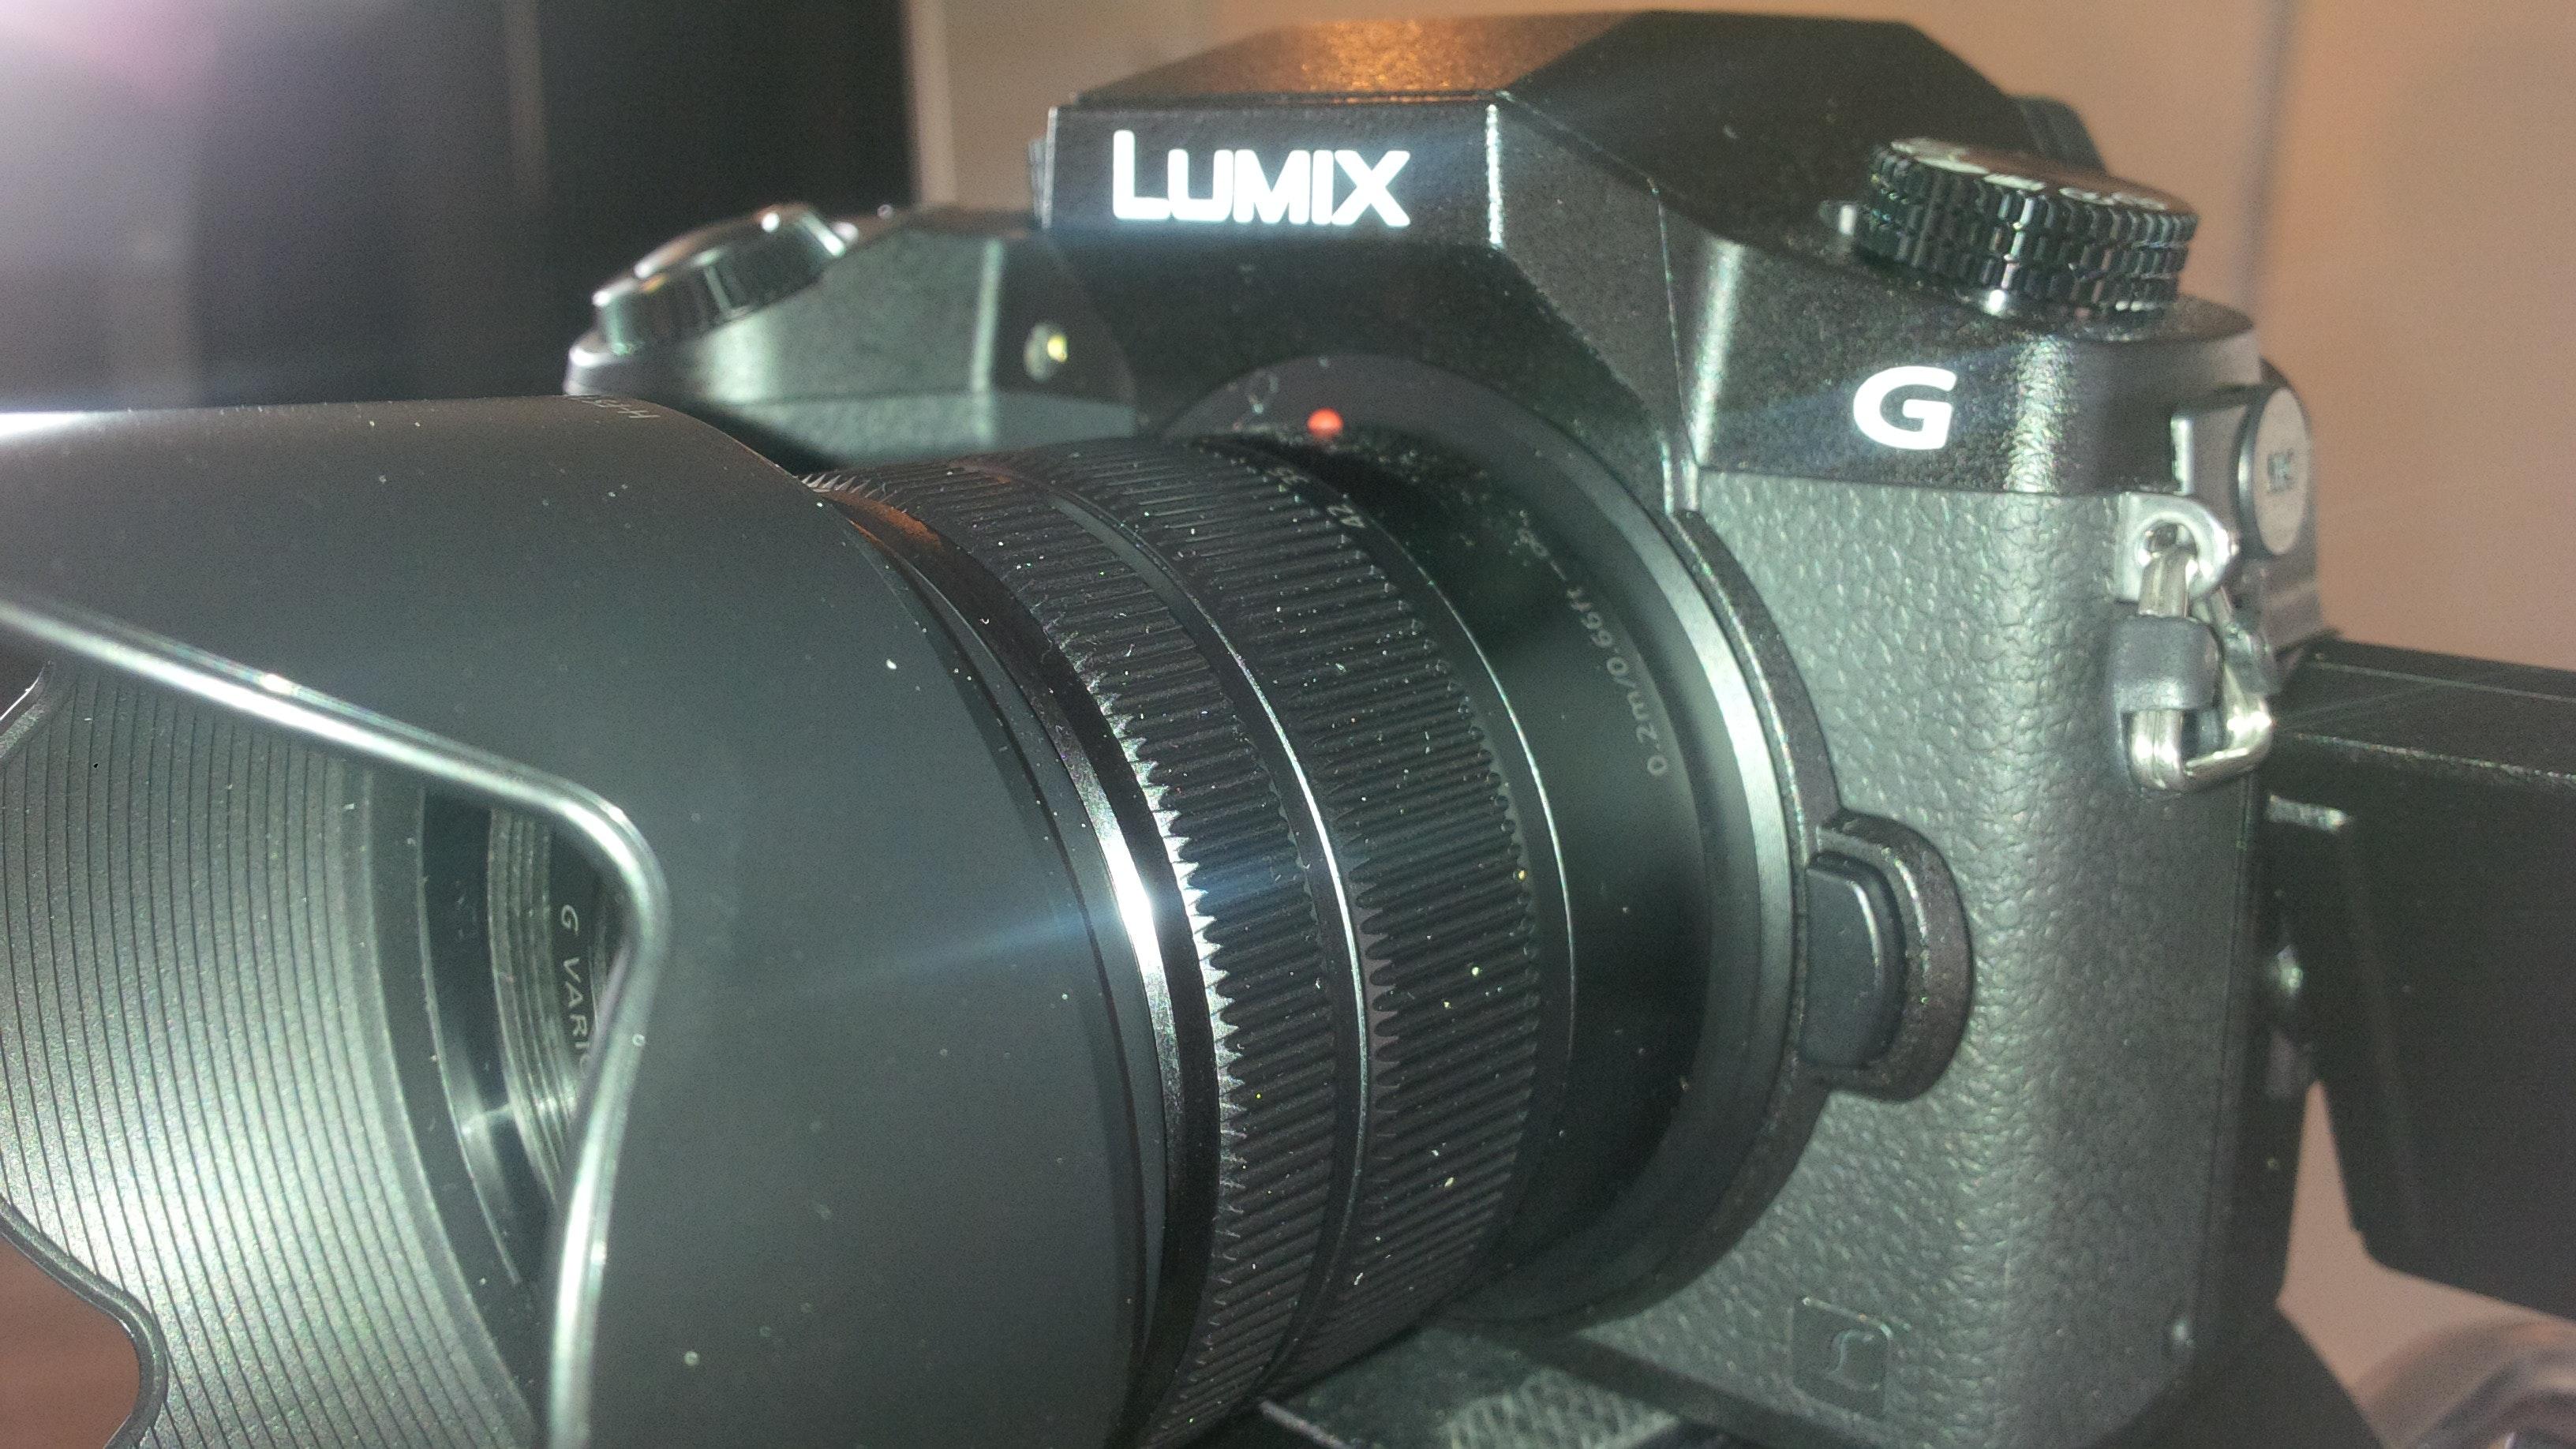 Free stock photo of digital camera, lumix, movie camera